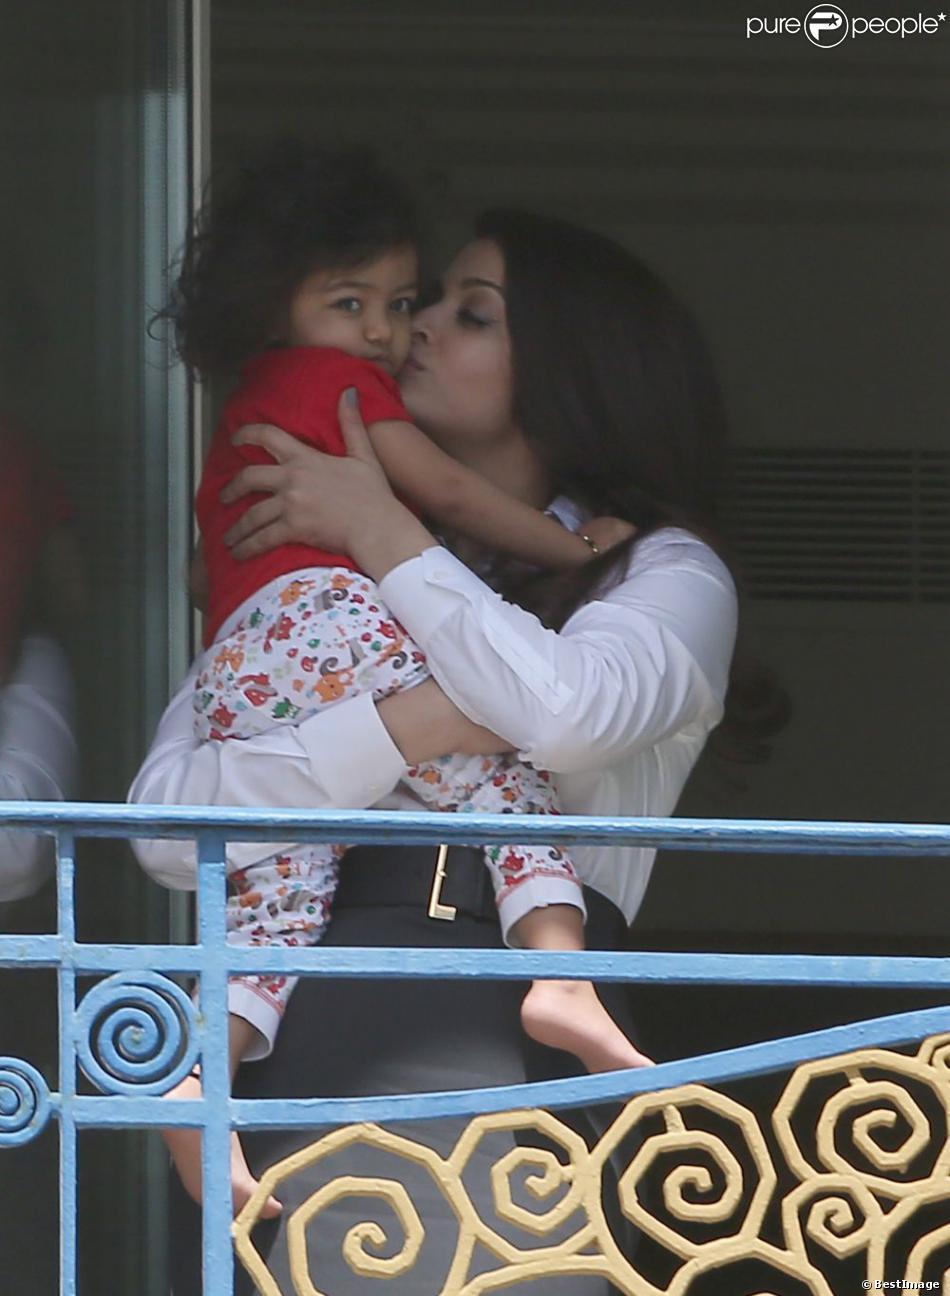 Aishwarya Rai câline tendrement sa fille Aaradhya à l'Hôtel Martinez, à Cannes le 19 mai 2013.